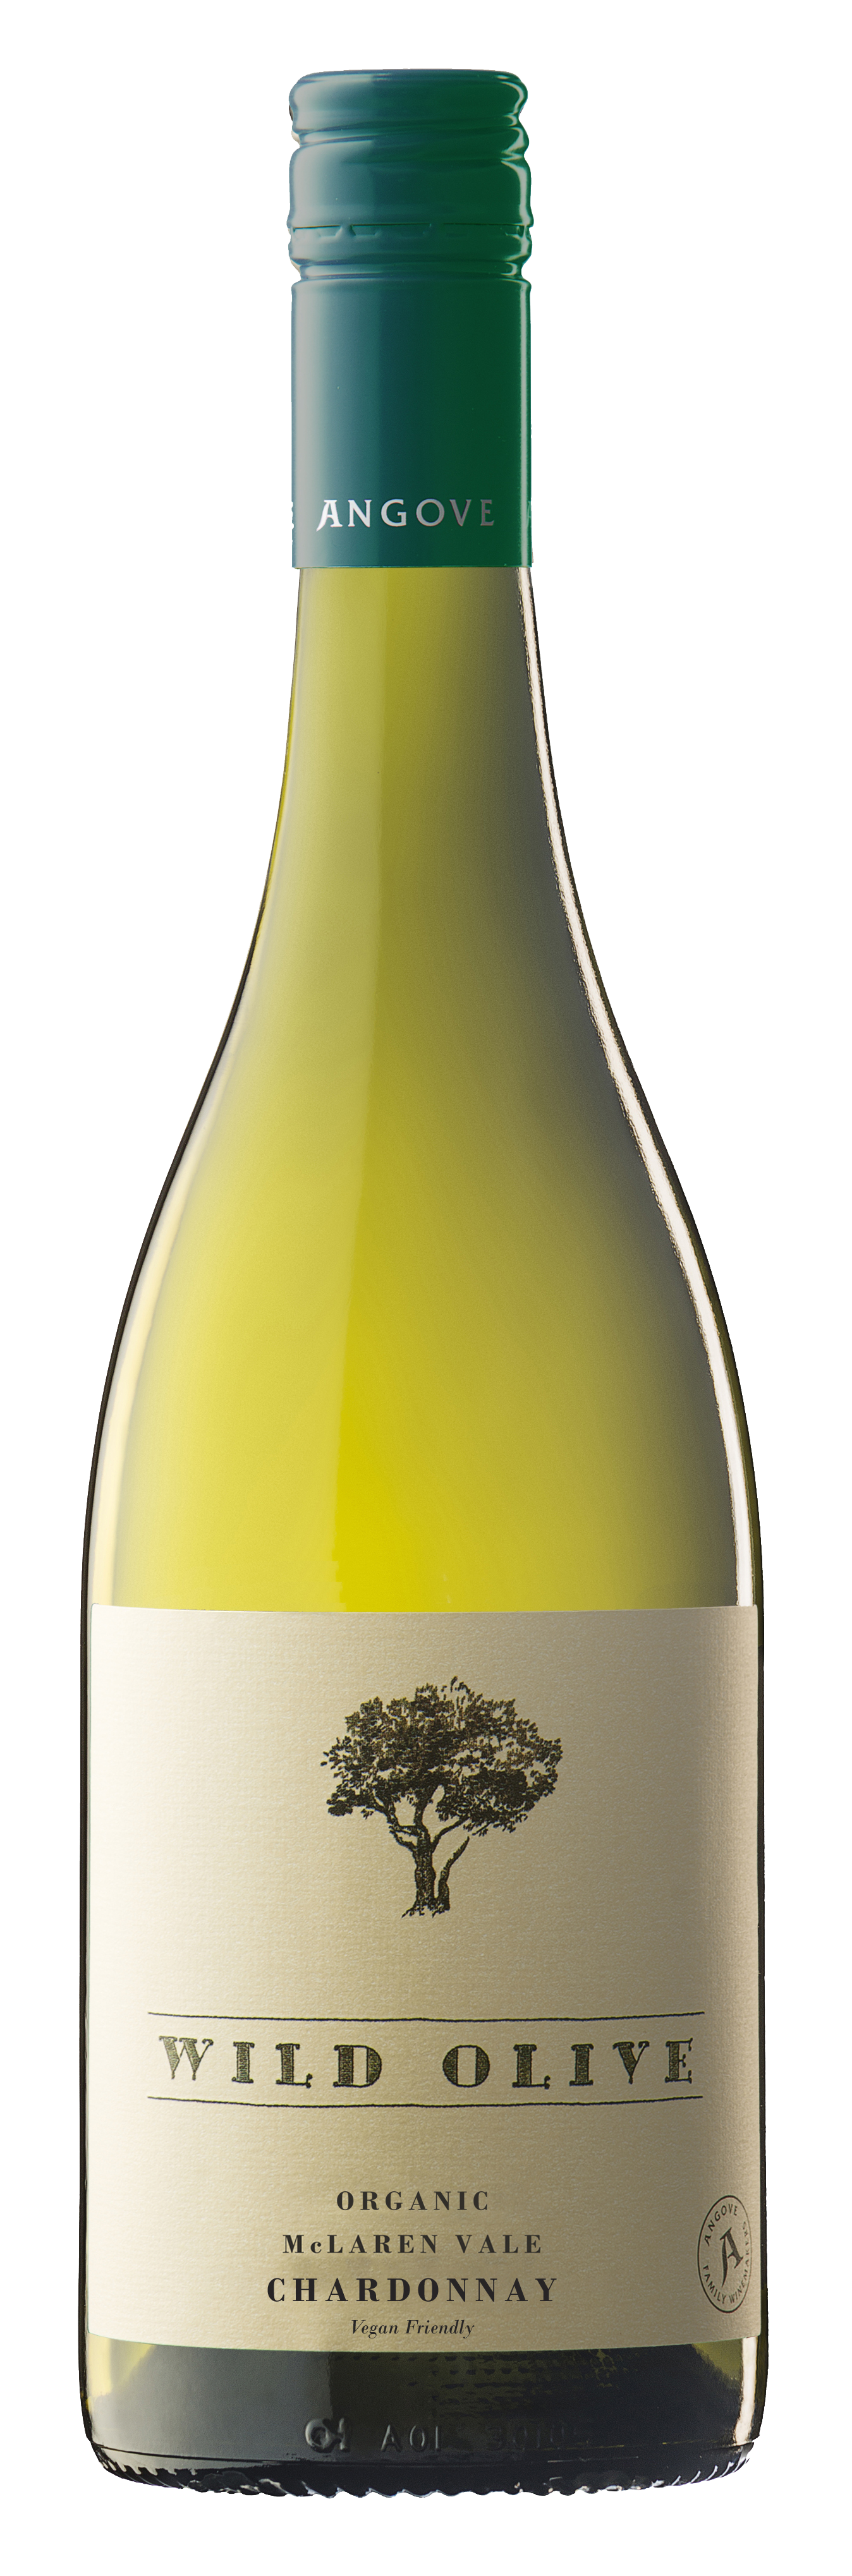 Organic Chardonnay